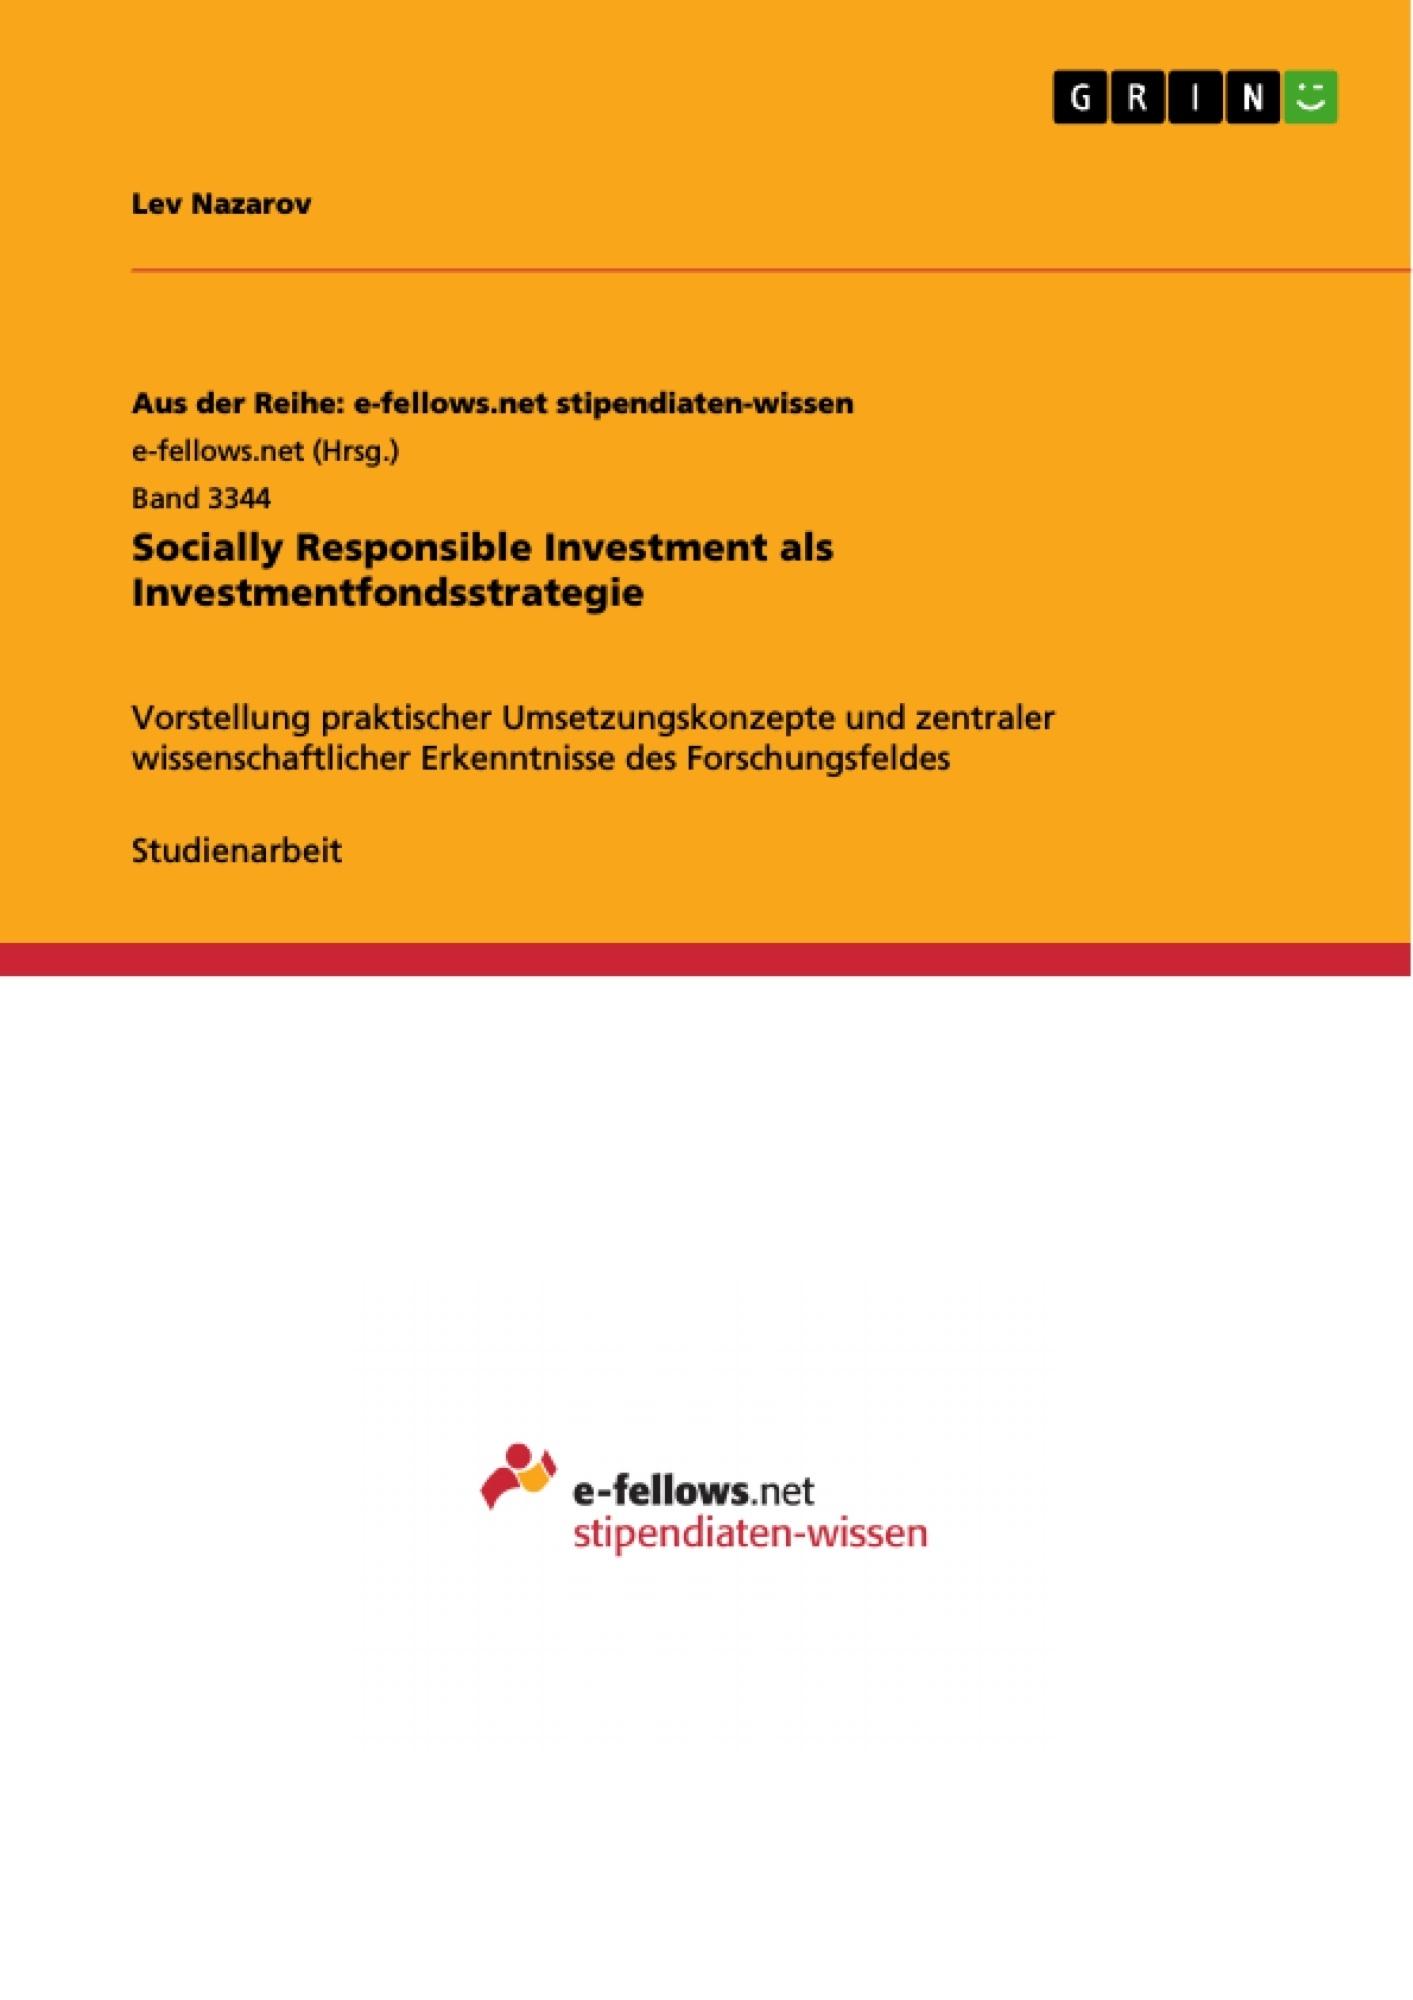 Titel: Socially Responsible Investment  als Investmentfondsstrategie